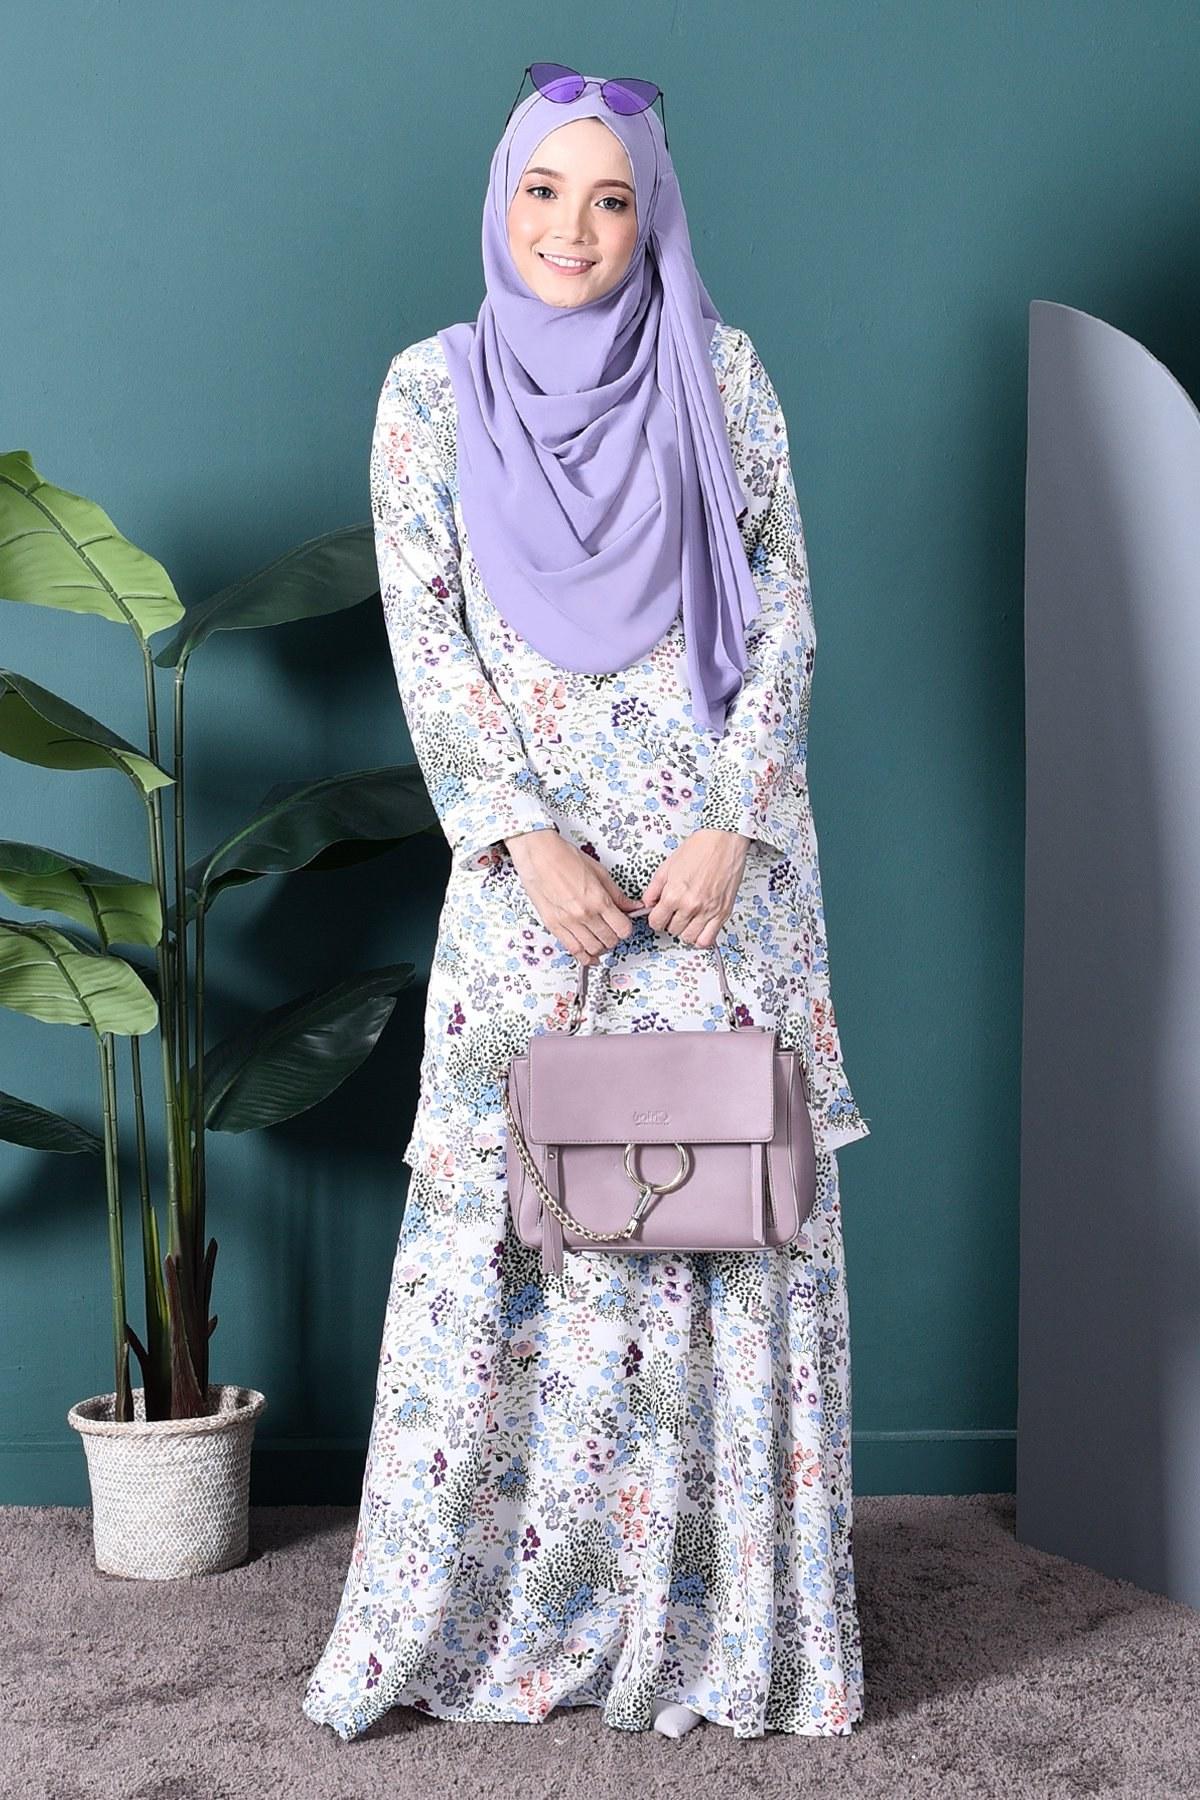 Model Model Baju Bridesmaid Hijab 2019 H9d9 Baju Kurung Agnes – Cotton White – Muslimahclothing